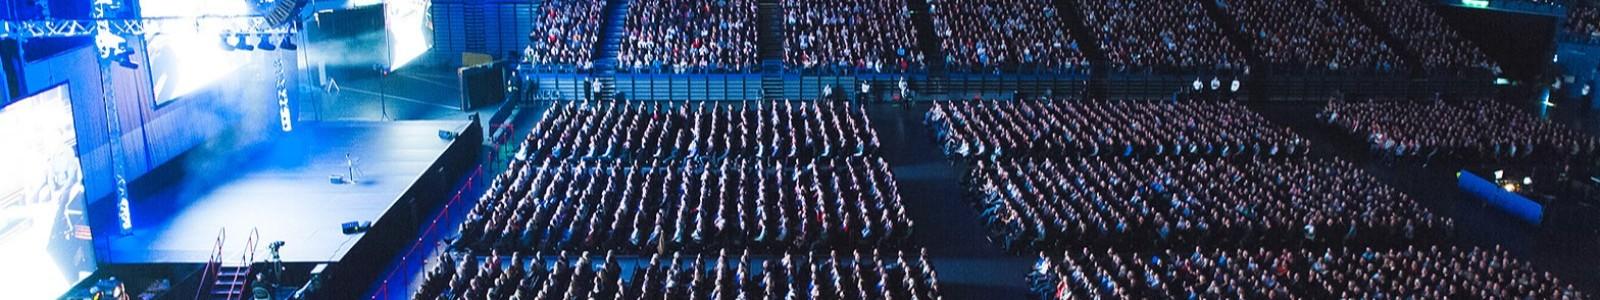 Resorts World Arena Birmingham